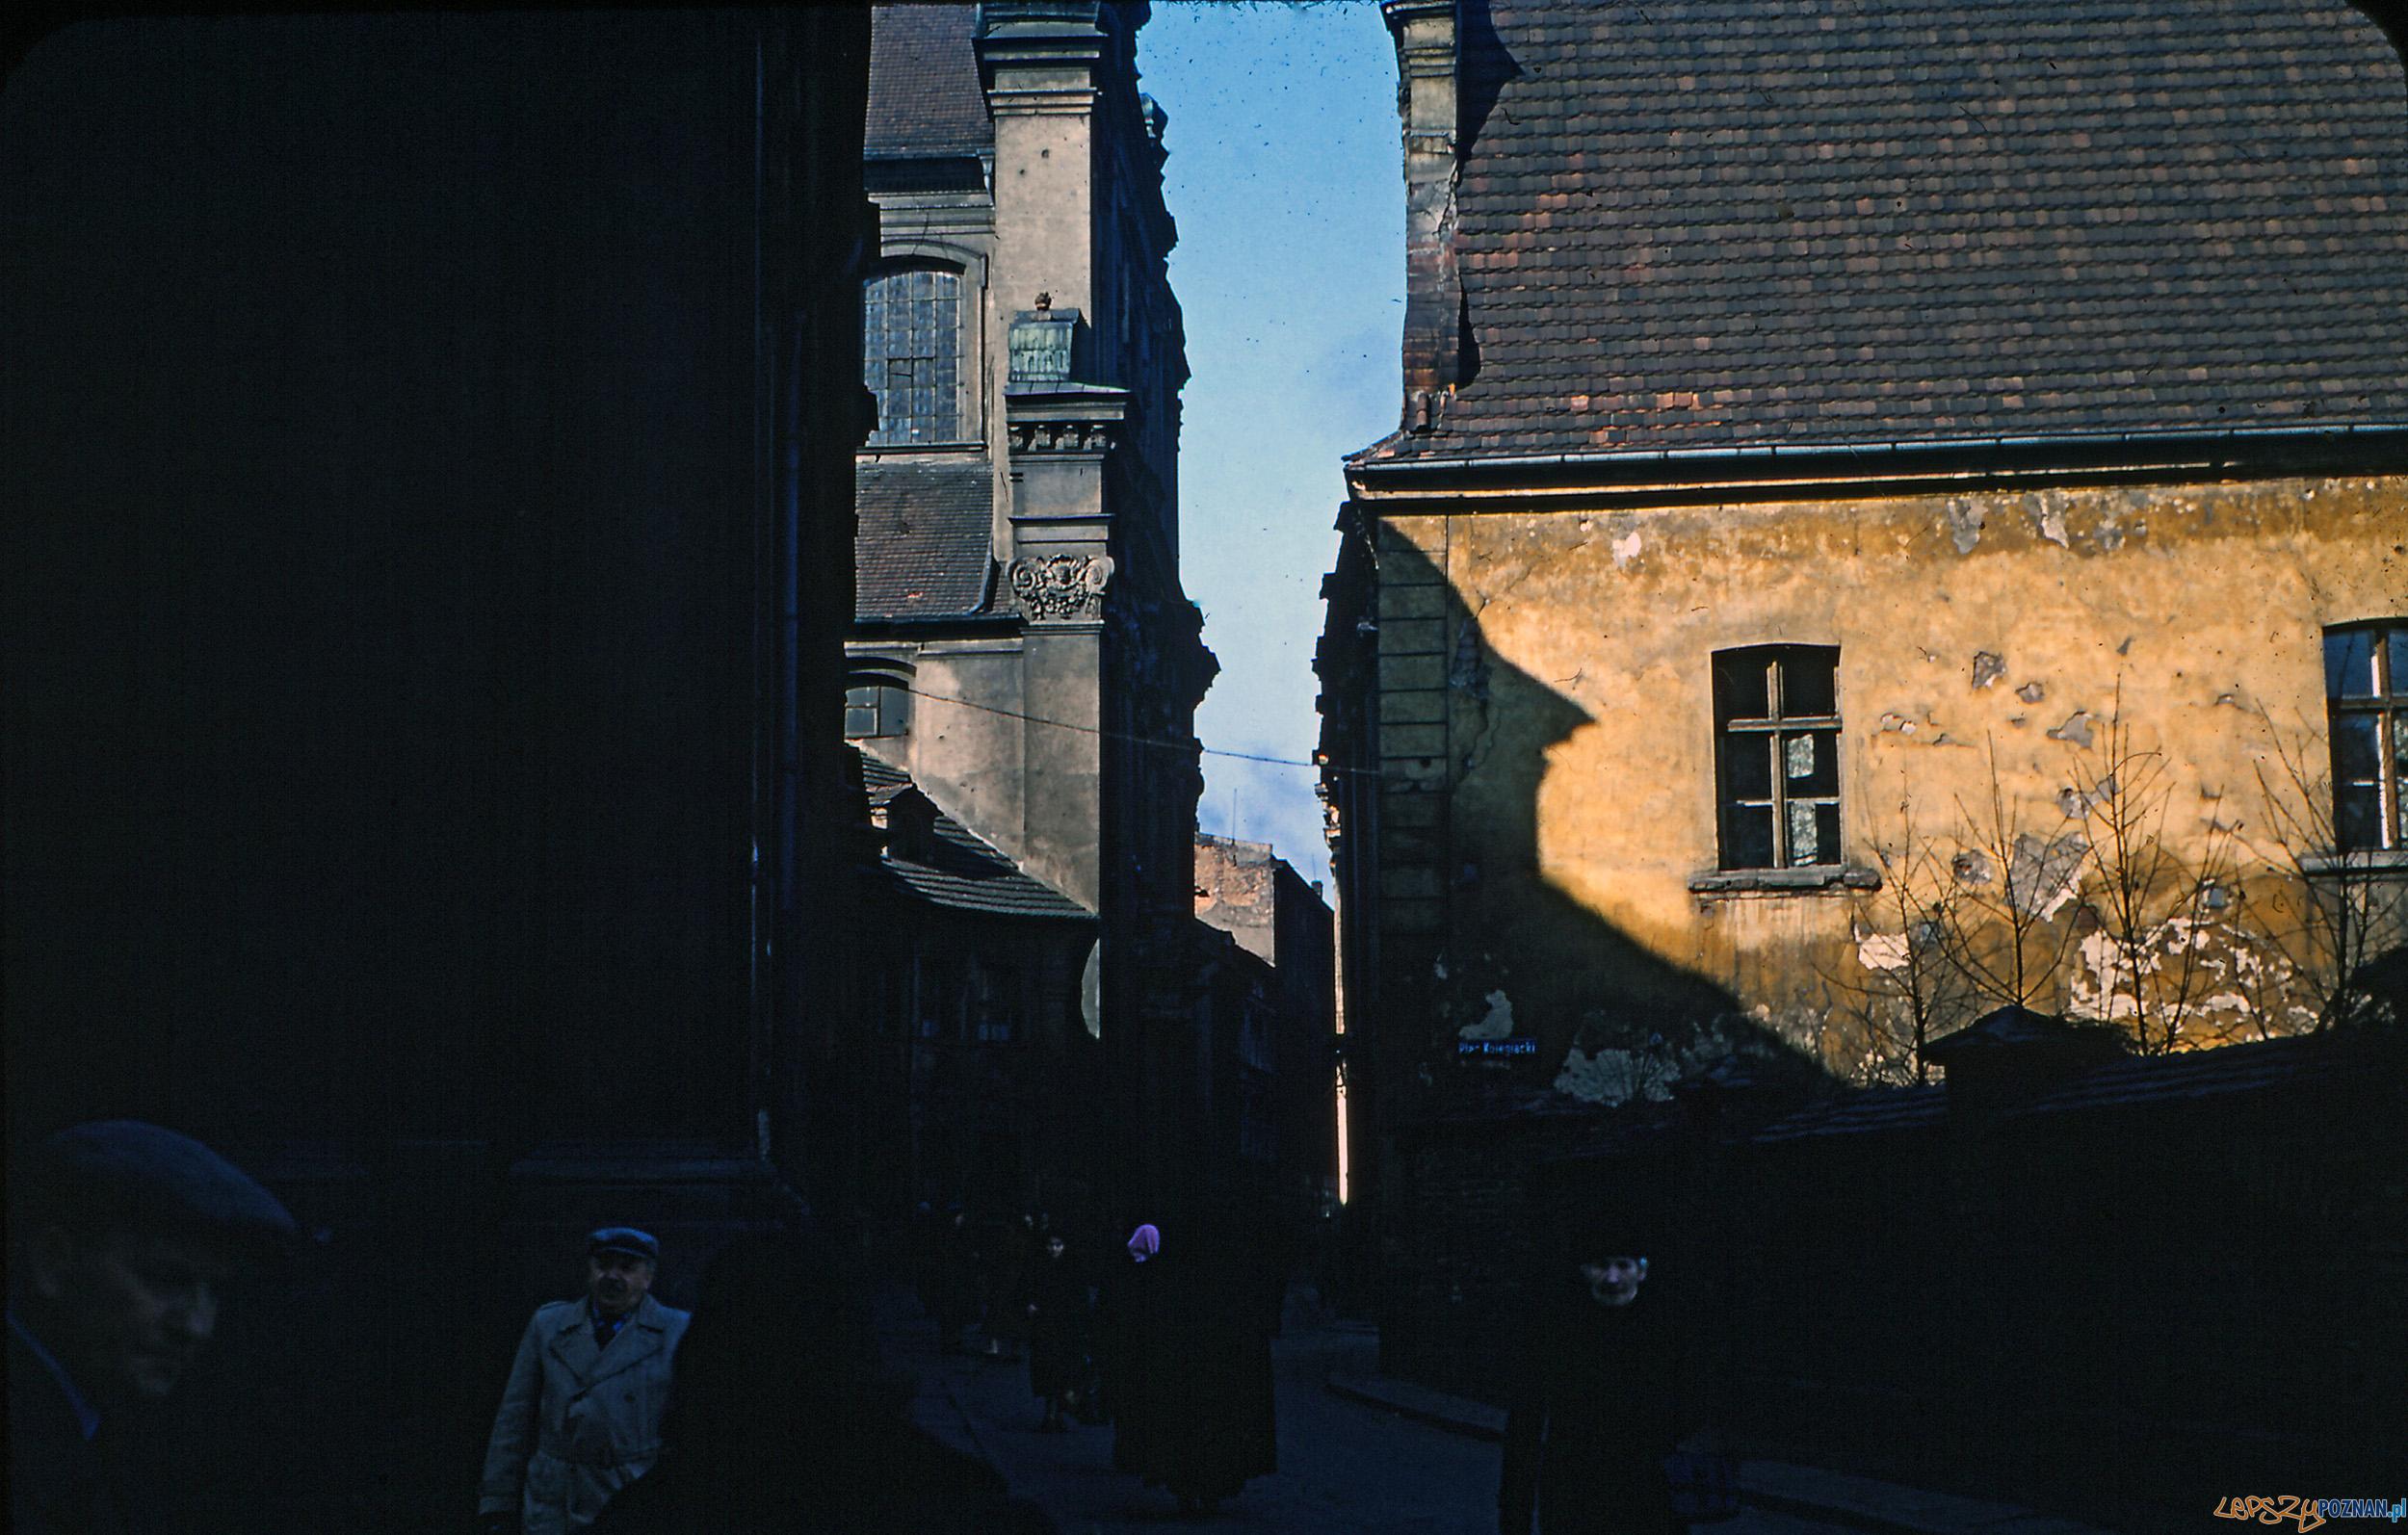 Gołębia - koniec lat 50-tych  Foto: Mogens Tørsleff, kolekcja Gorma Rudschinata / Flickr / CC